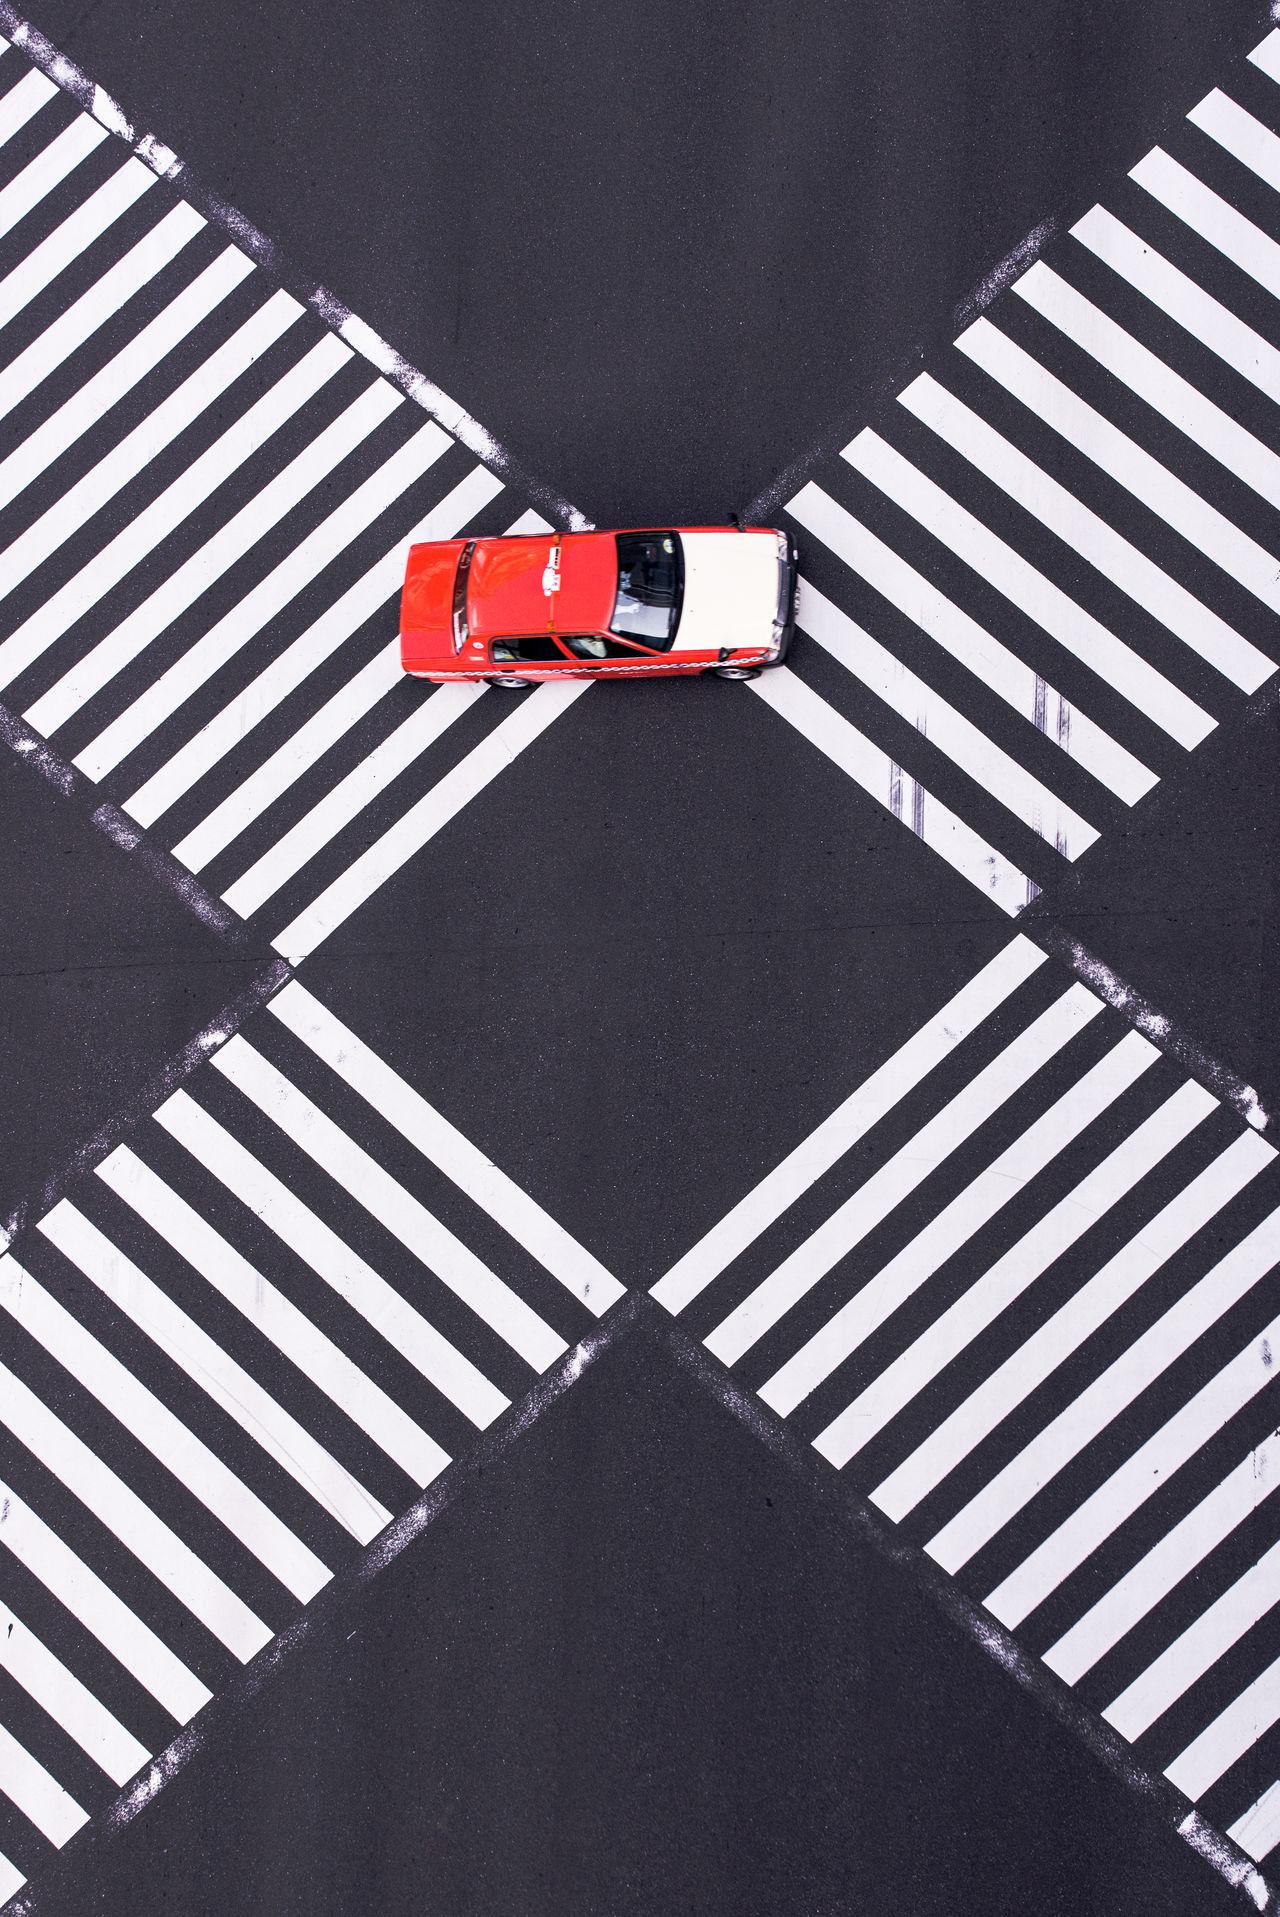 cross Creativity Japan Minimal Minimalism Minimalist Minimalobsession Modern No People Tokyo Traffic Car The Drive